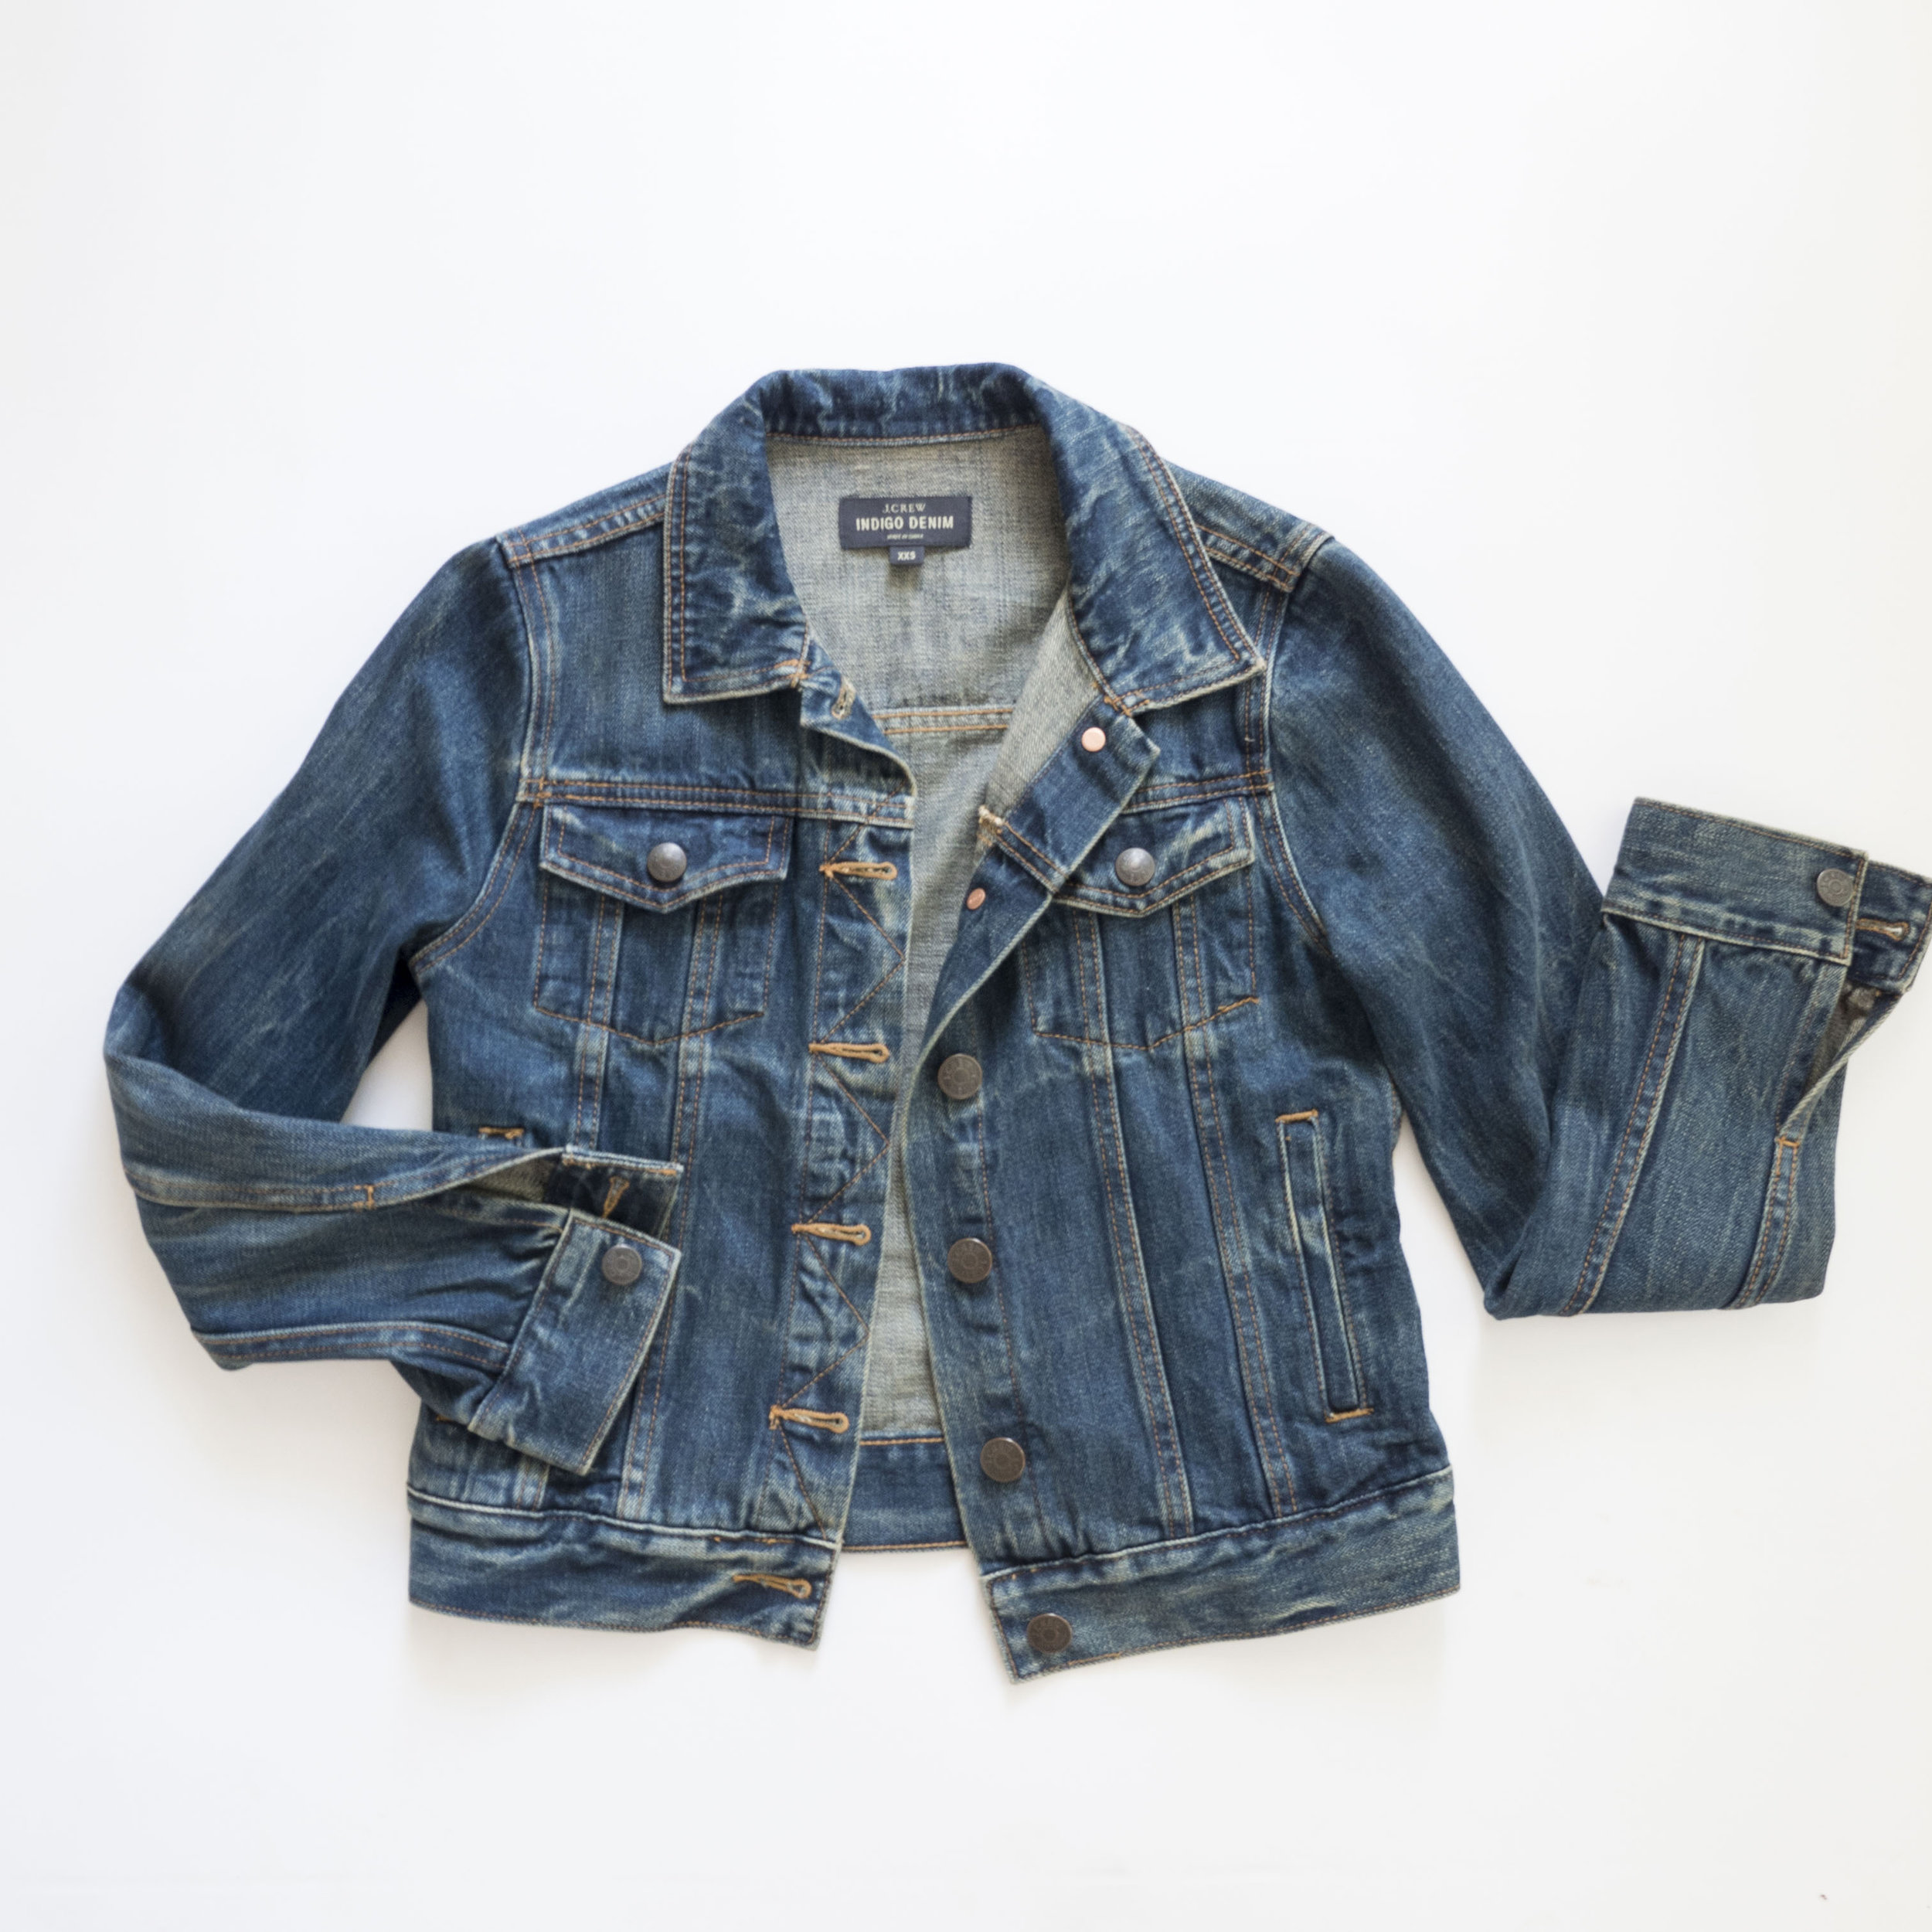 jcrew-denim-jacket.jpg